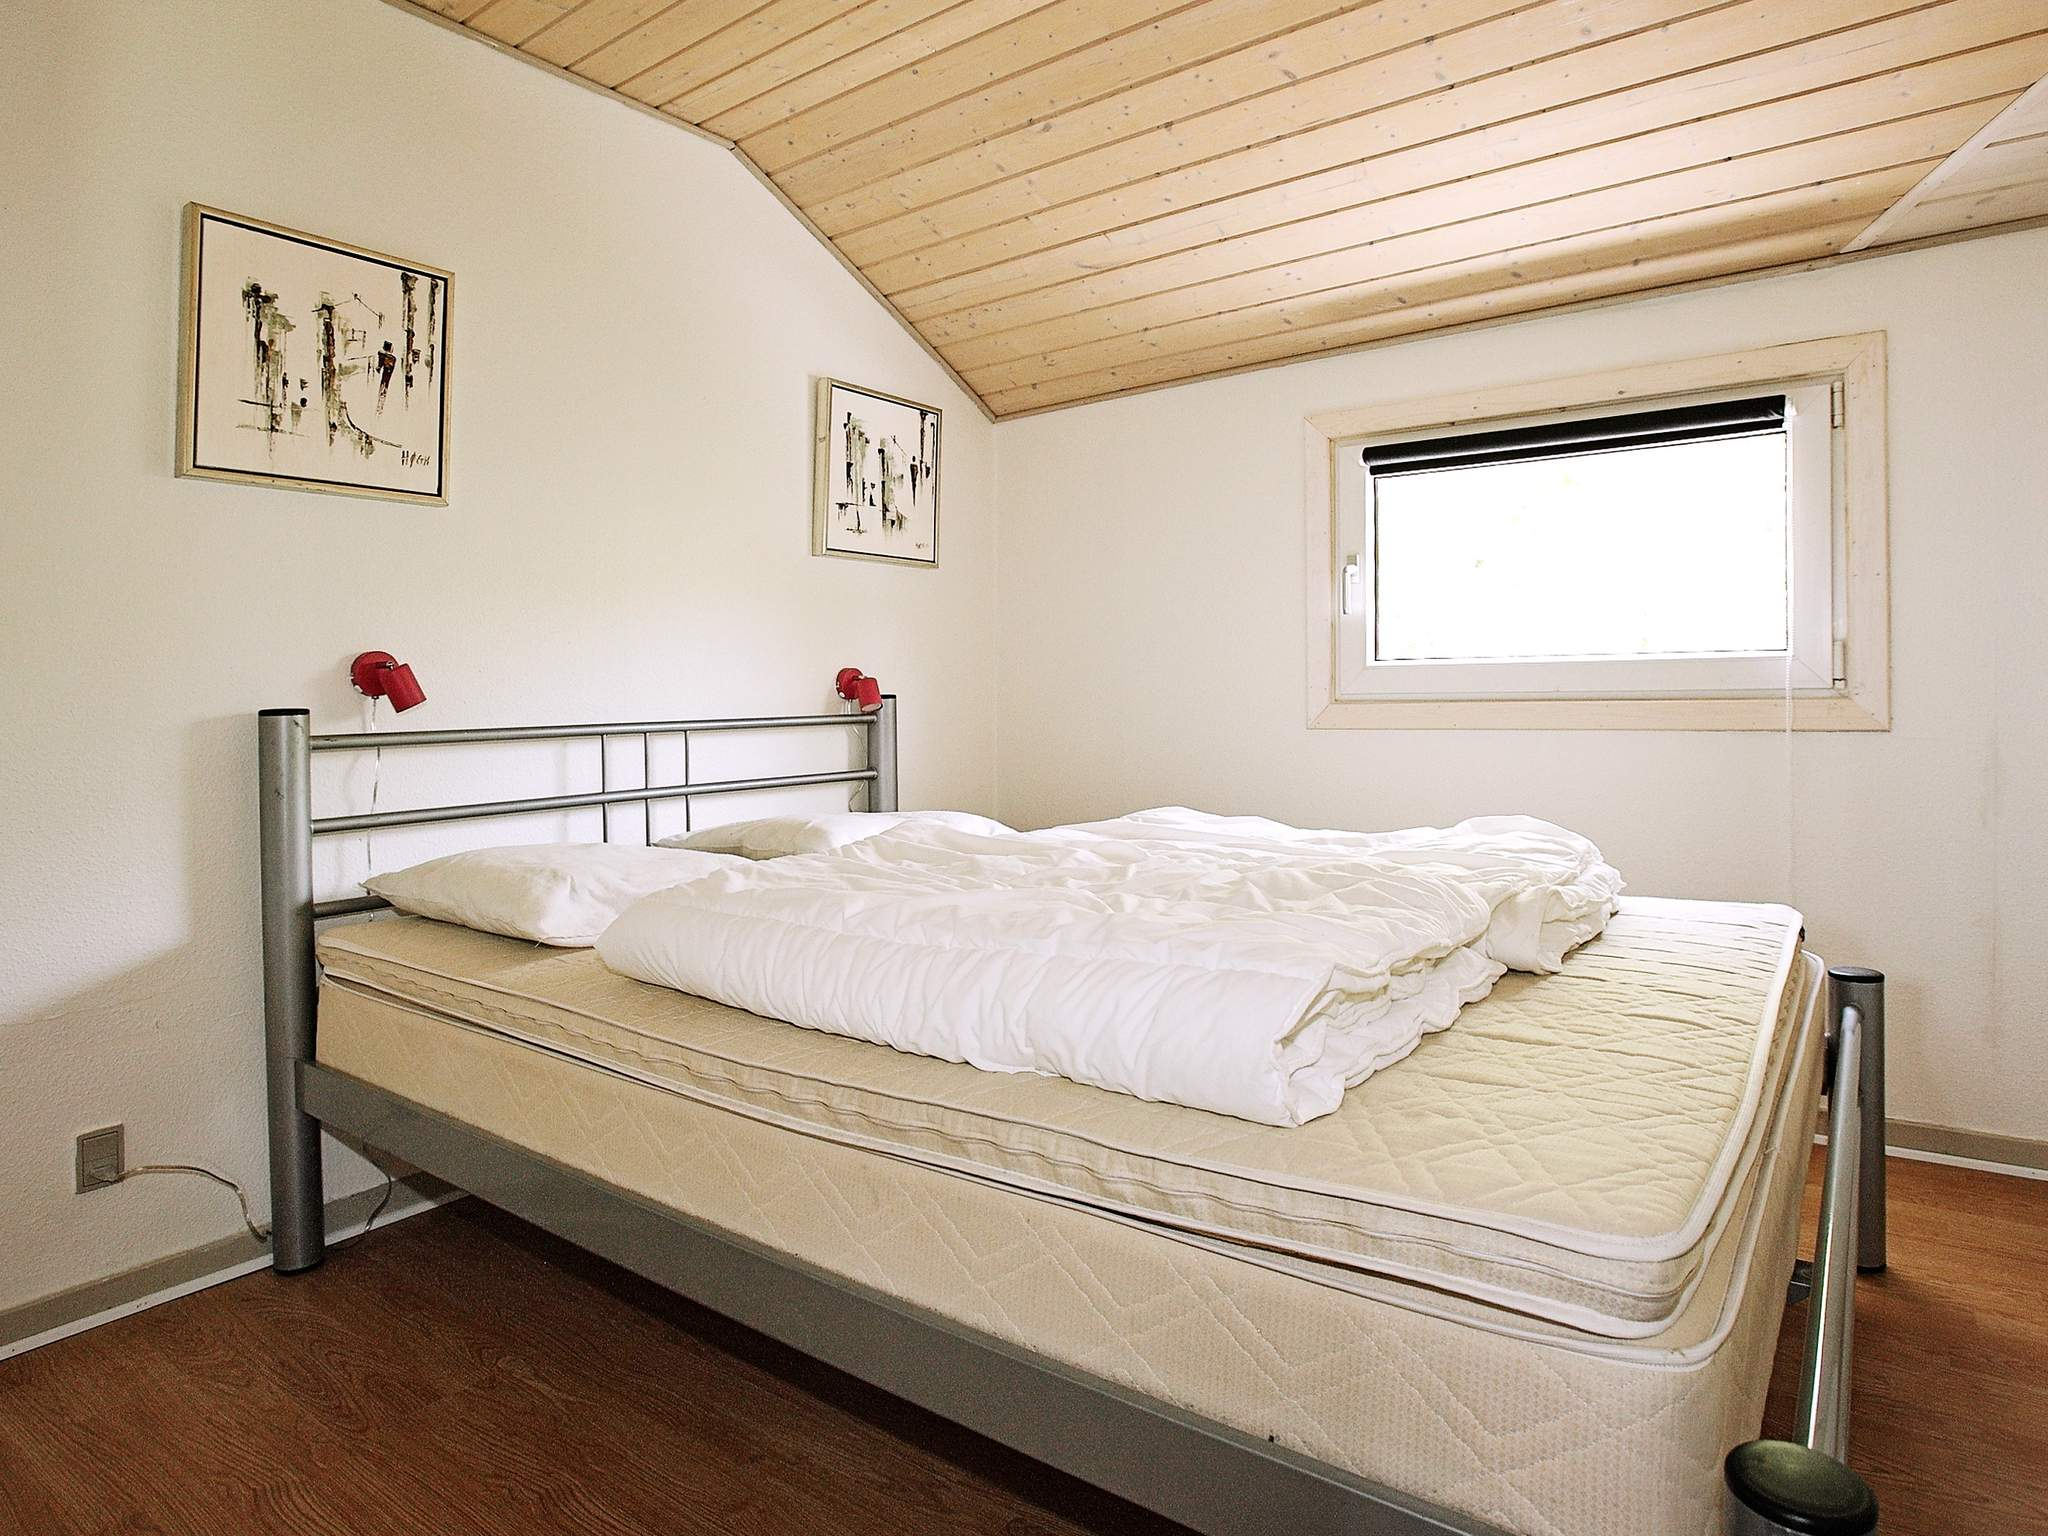 Ferienhaus Øster Hurup (88055), Øster Hurup, , Ostjütland, Dänemark, Bild 8